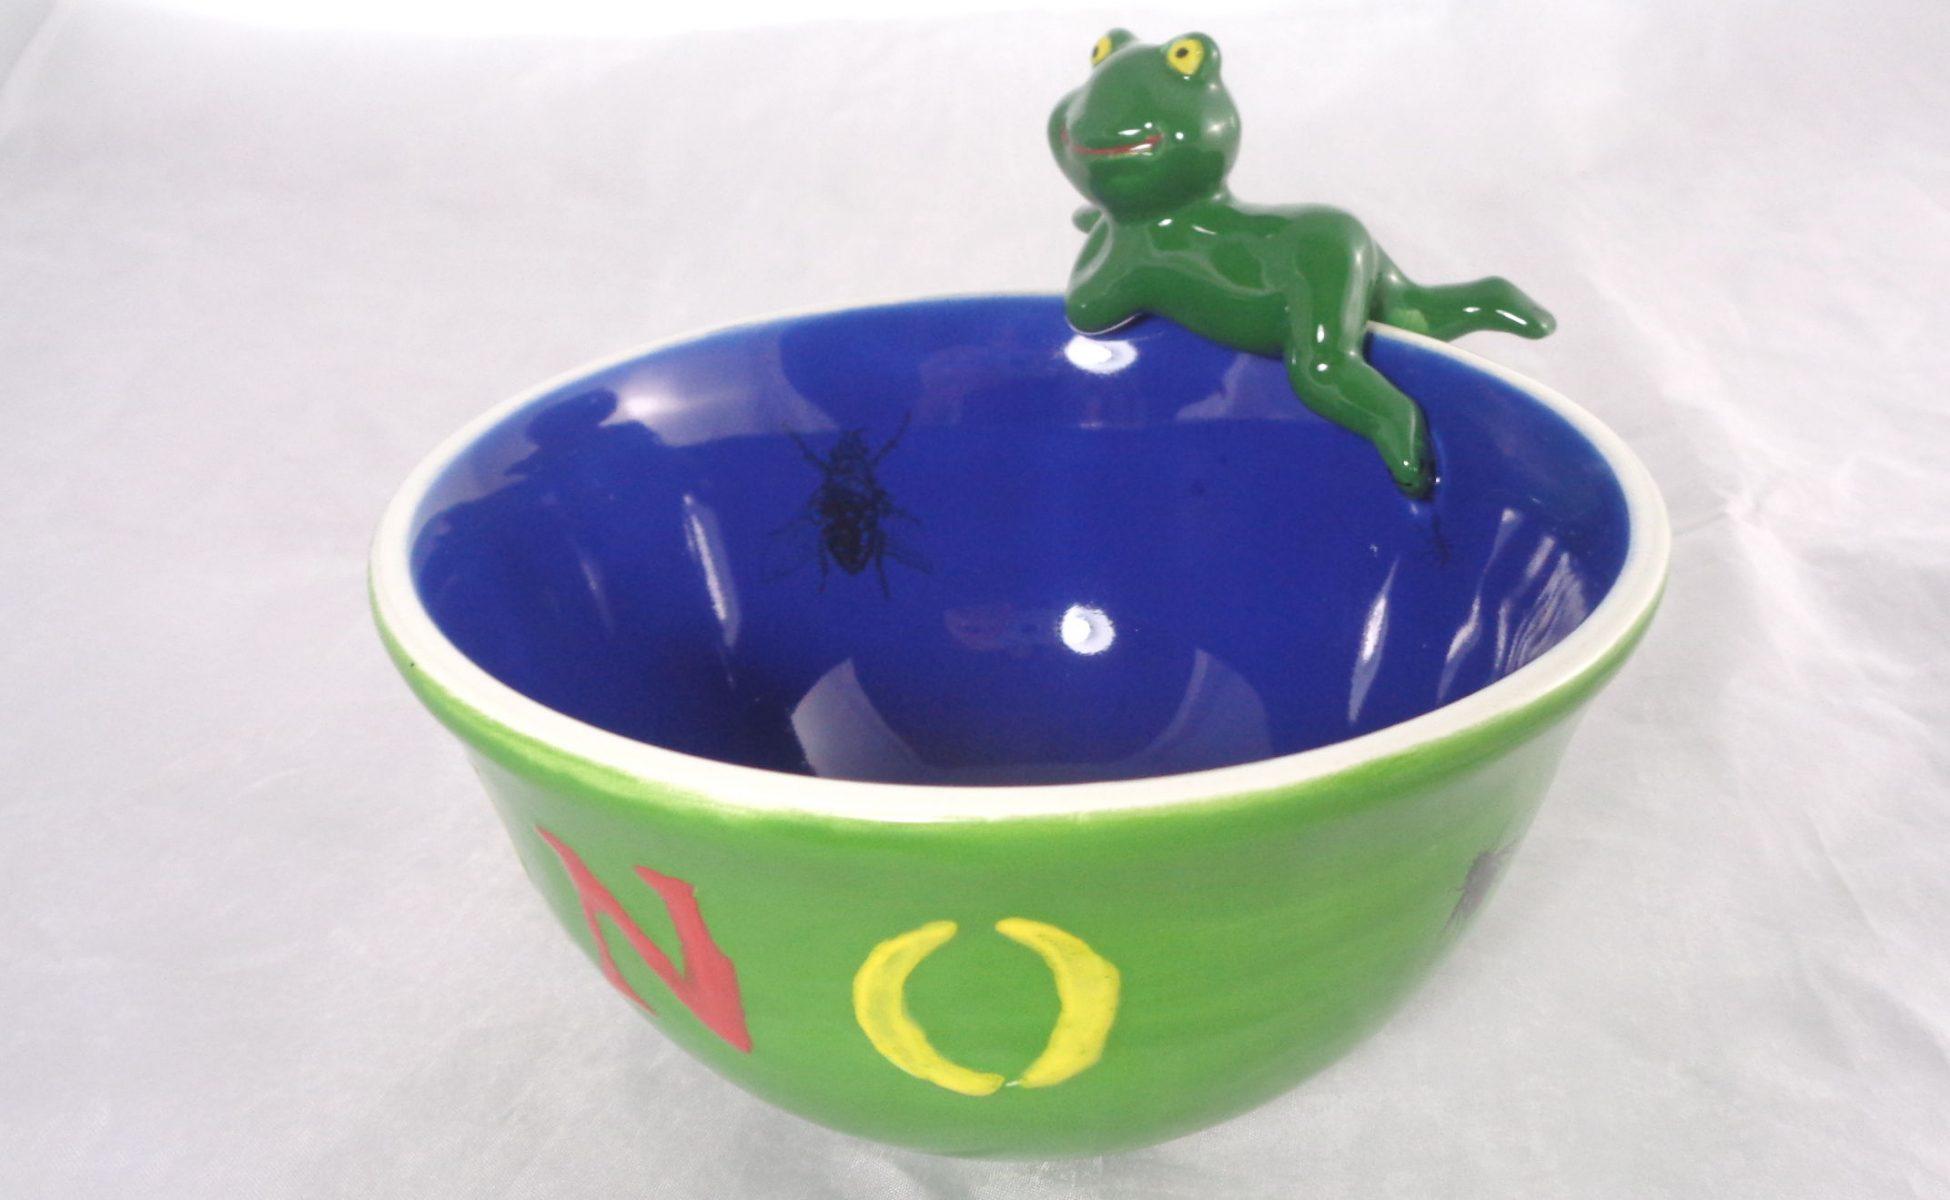 Bemalte Keramik Vintage Froschteich No2